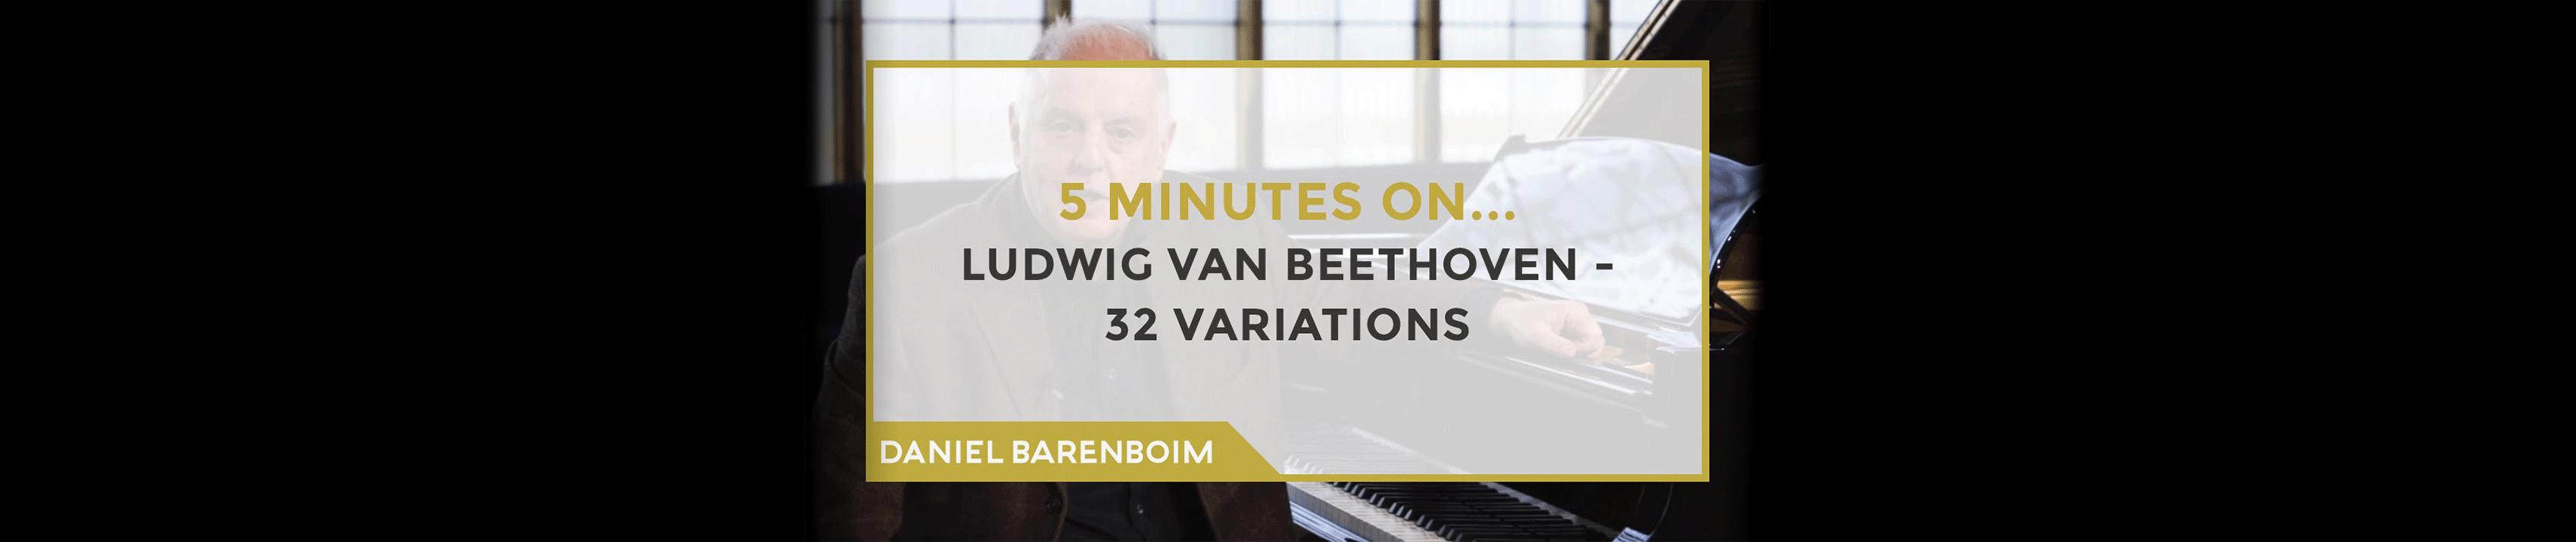 Daniel Barenboim, Beethoven's 32 Variations in C Minor